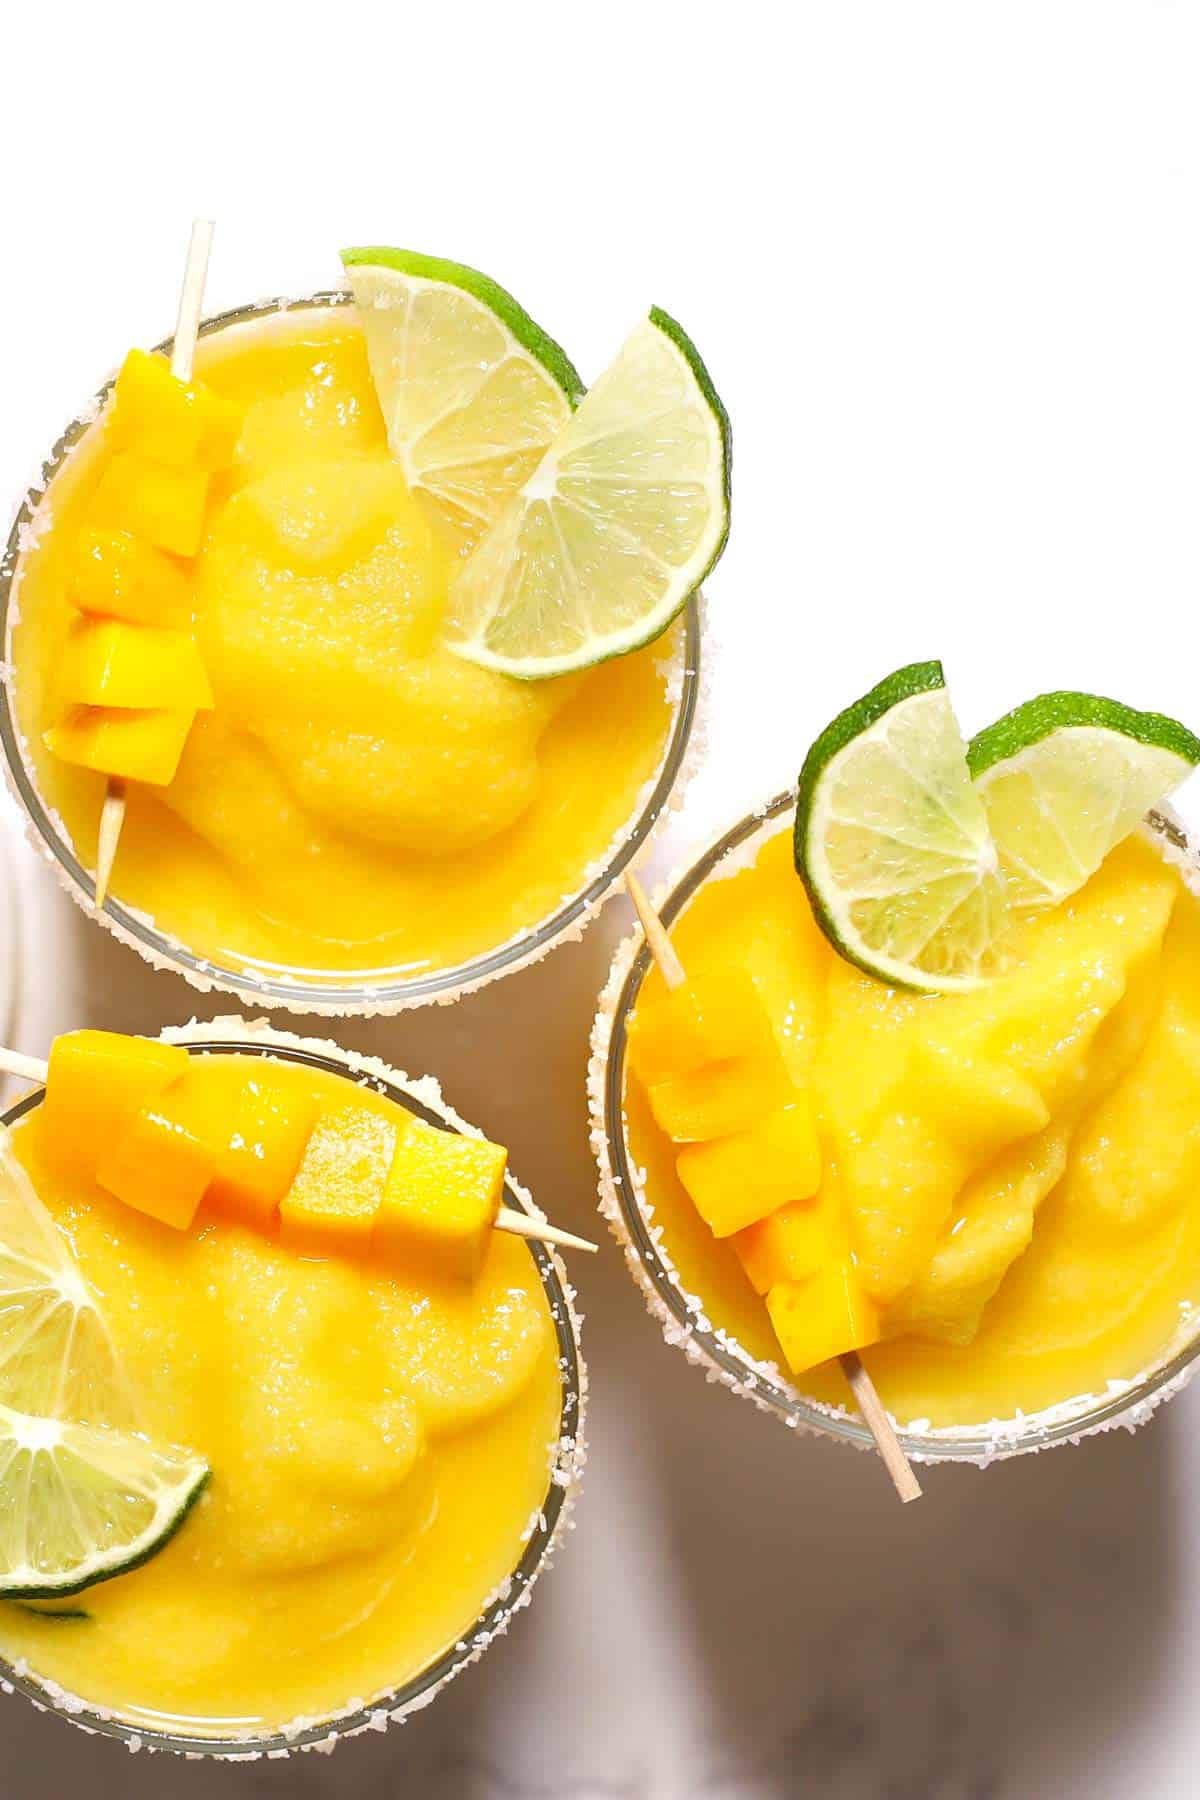 Frozen mango margaritas garnished with lime and fresh mango.